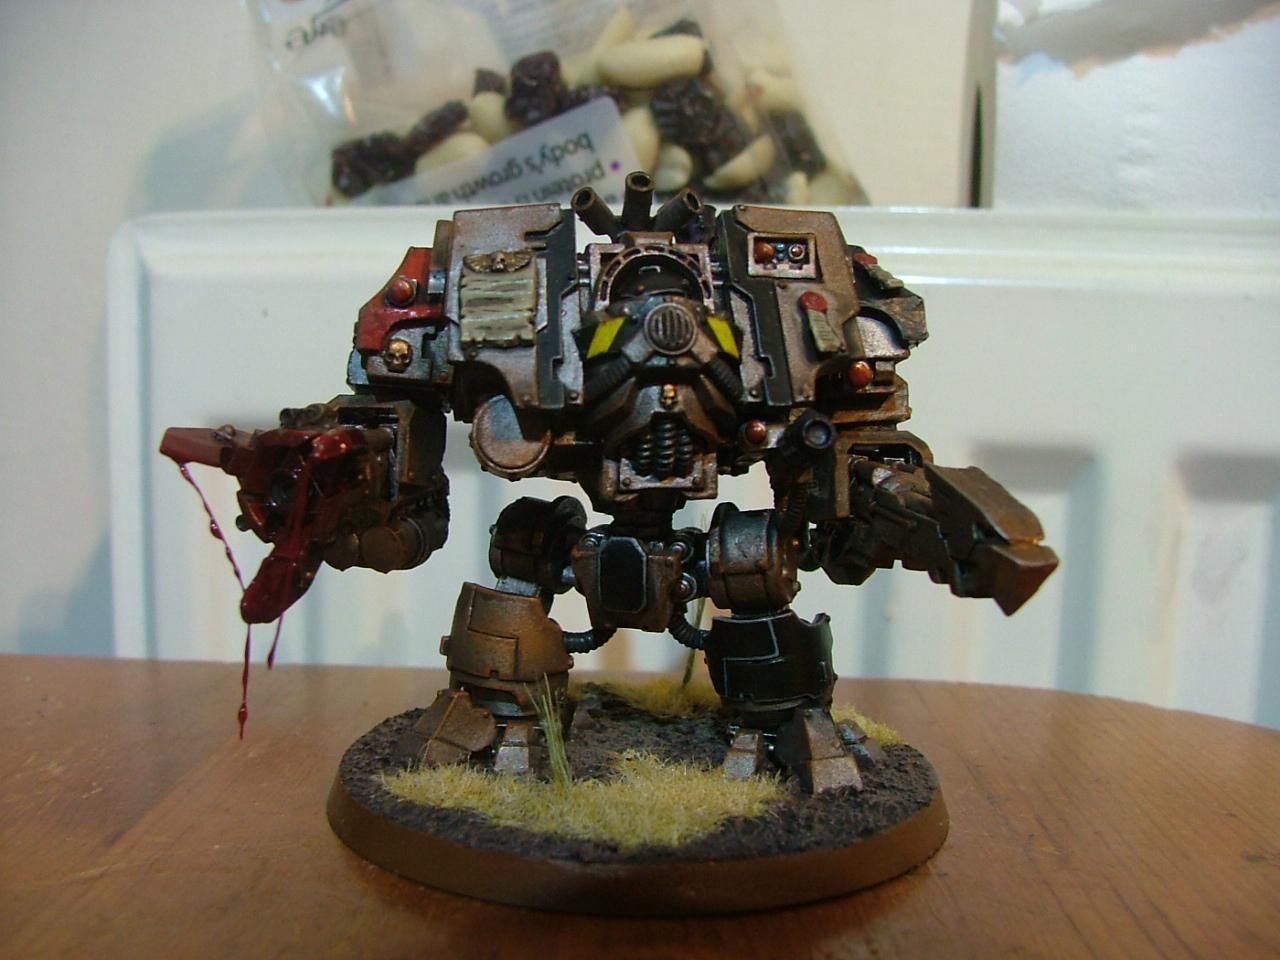 Dreadnought,  Iron clad dreadnought